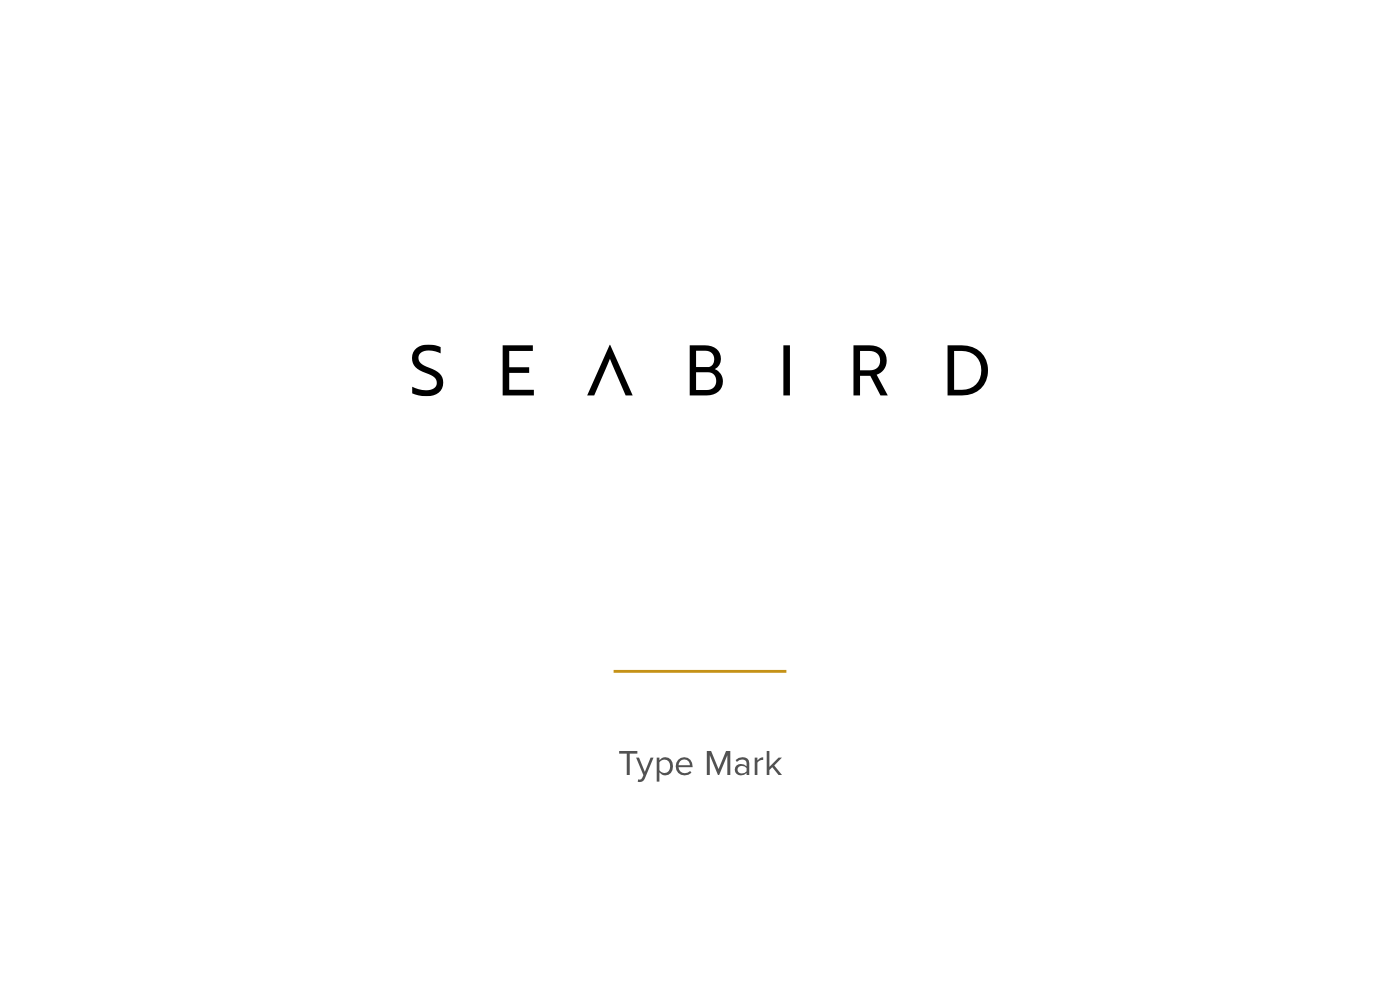 Seabird - Typmark.png